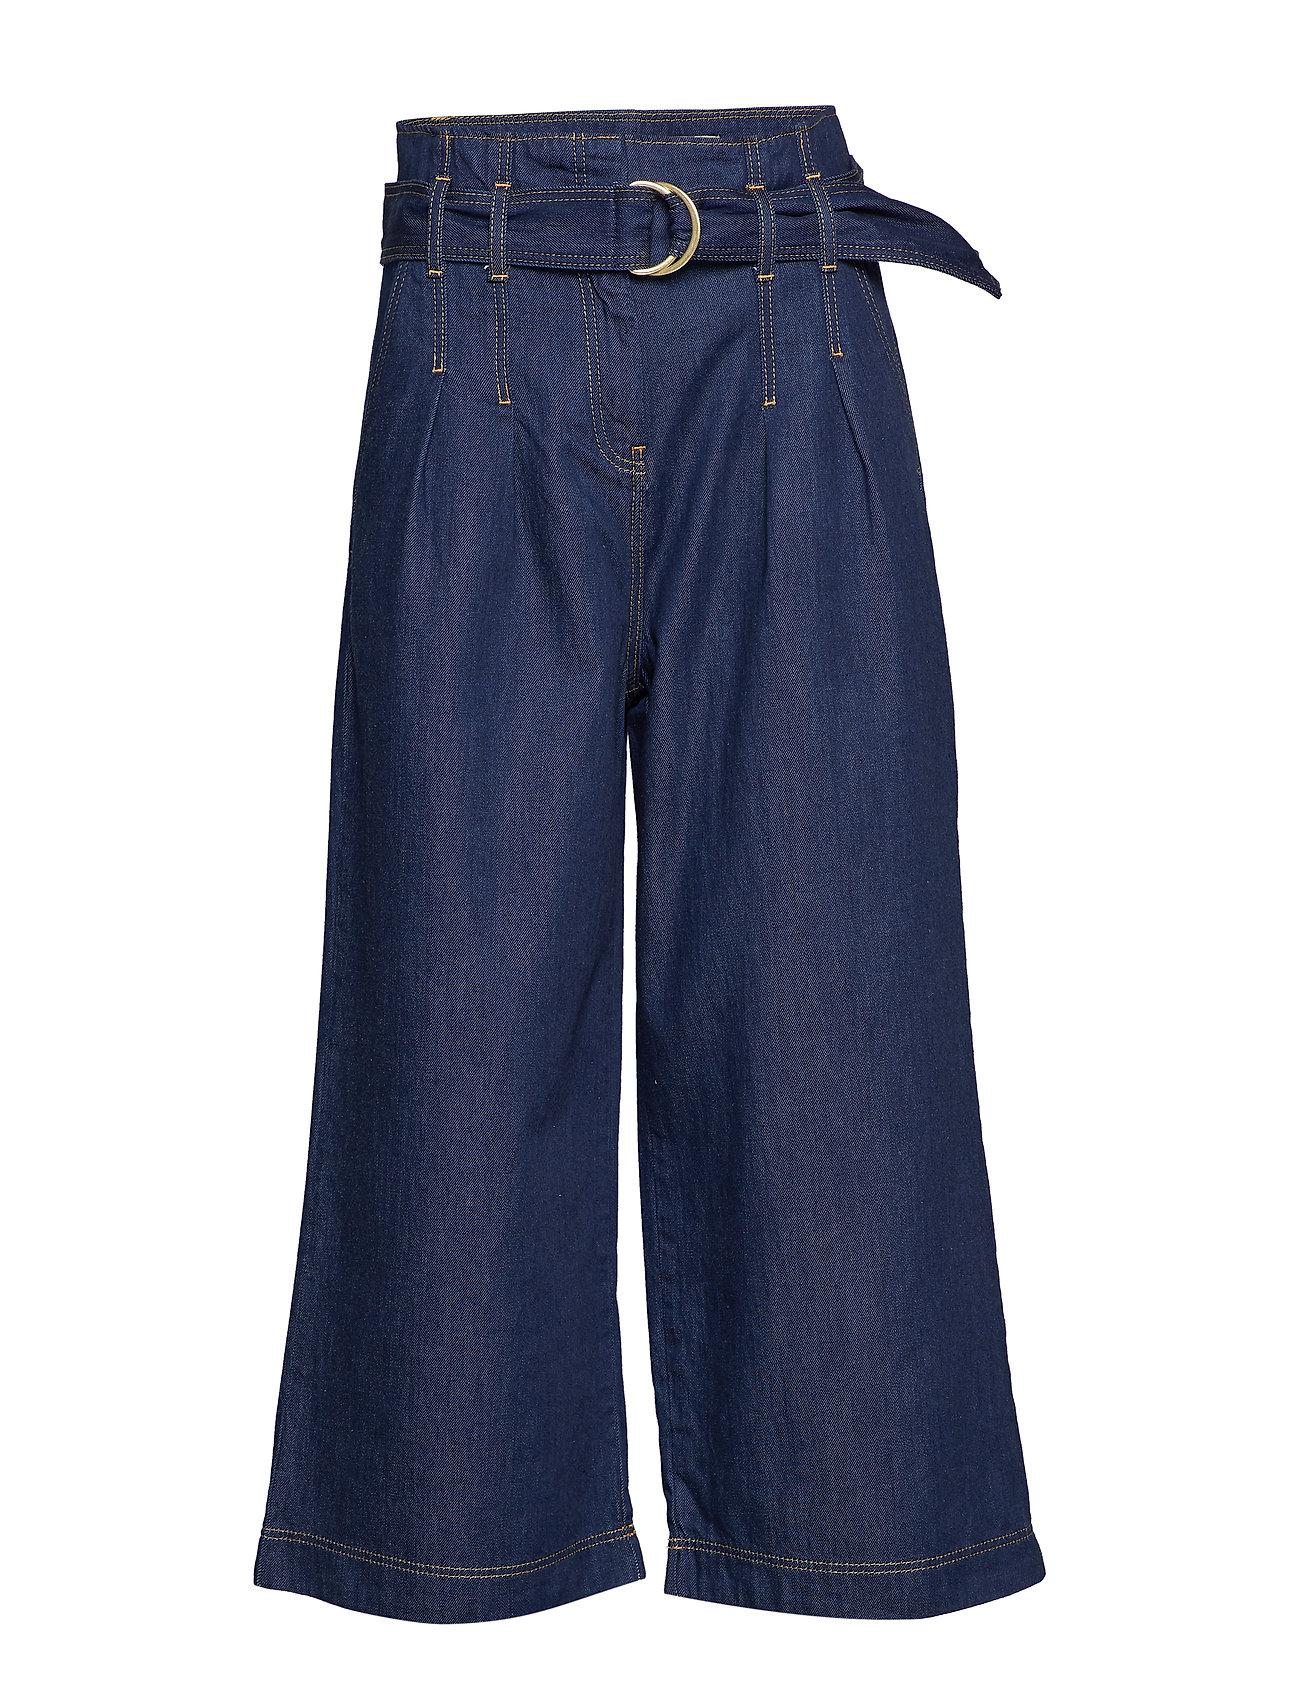 Image of Trousers Vide Bukser Blå Noa Noa (3122437527)